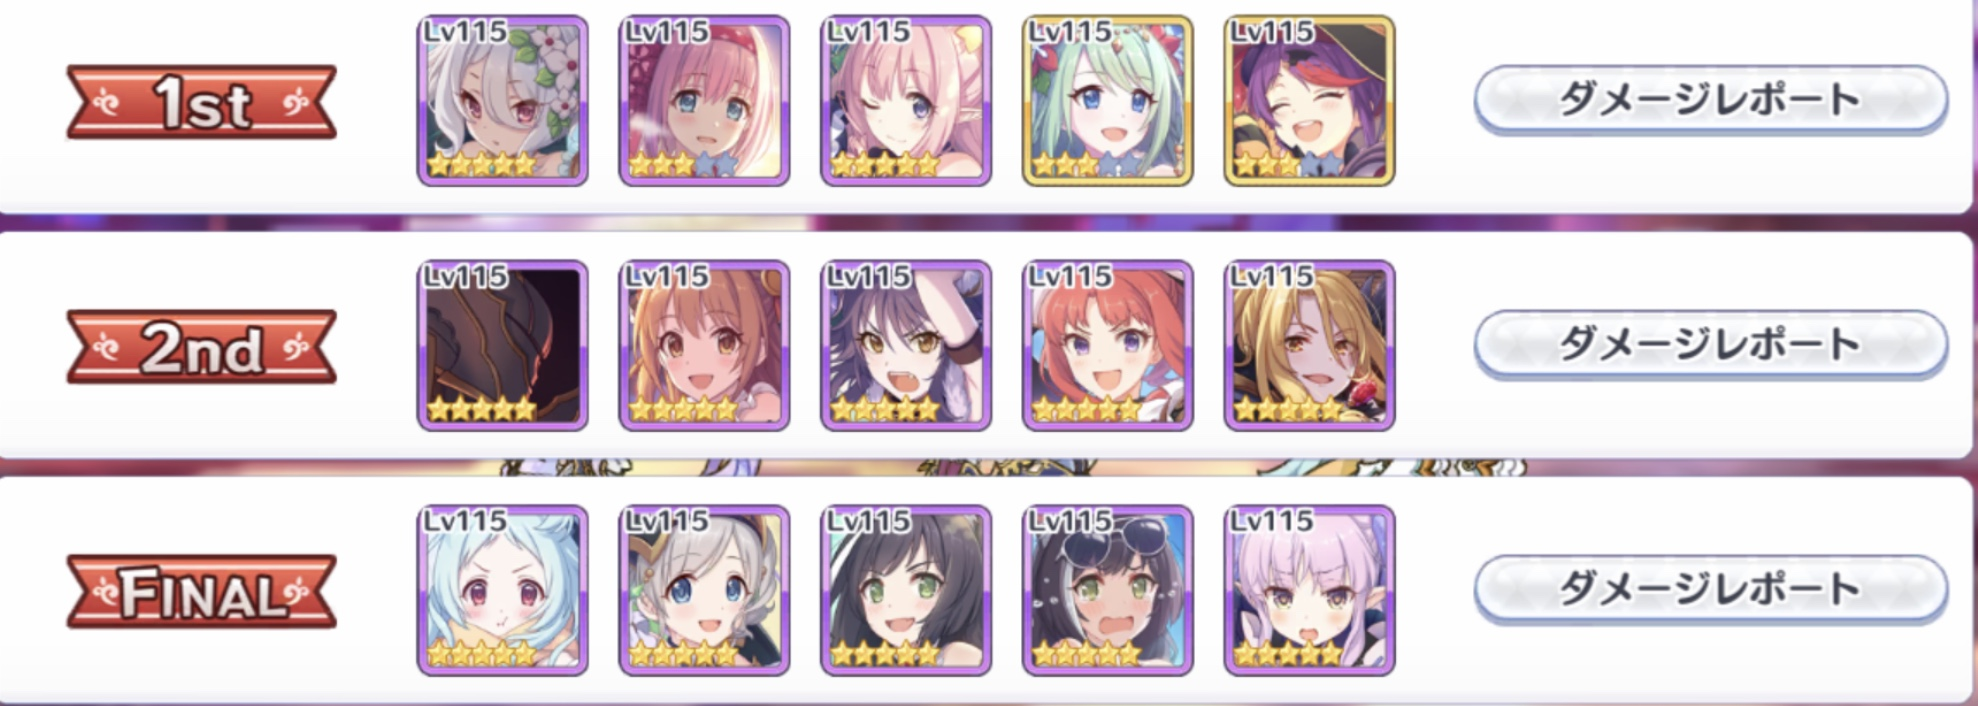 82F7B548-0CE3-44F5-A0E4-1C9E5BE3F3F8.jpeg